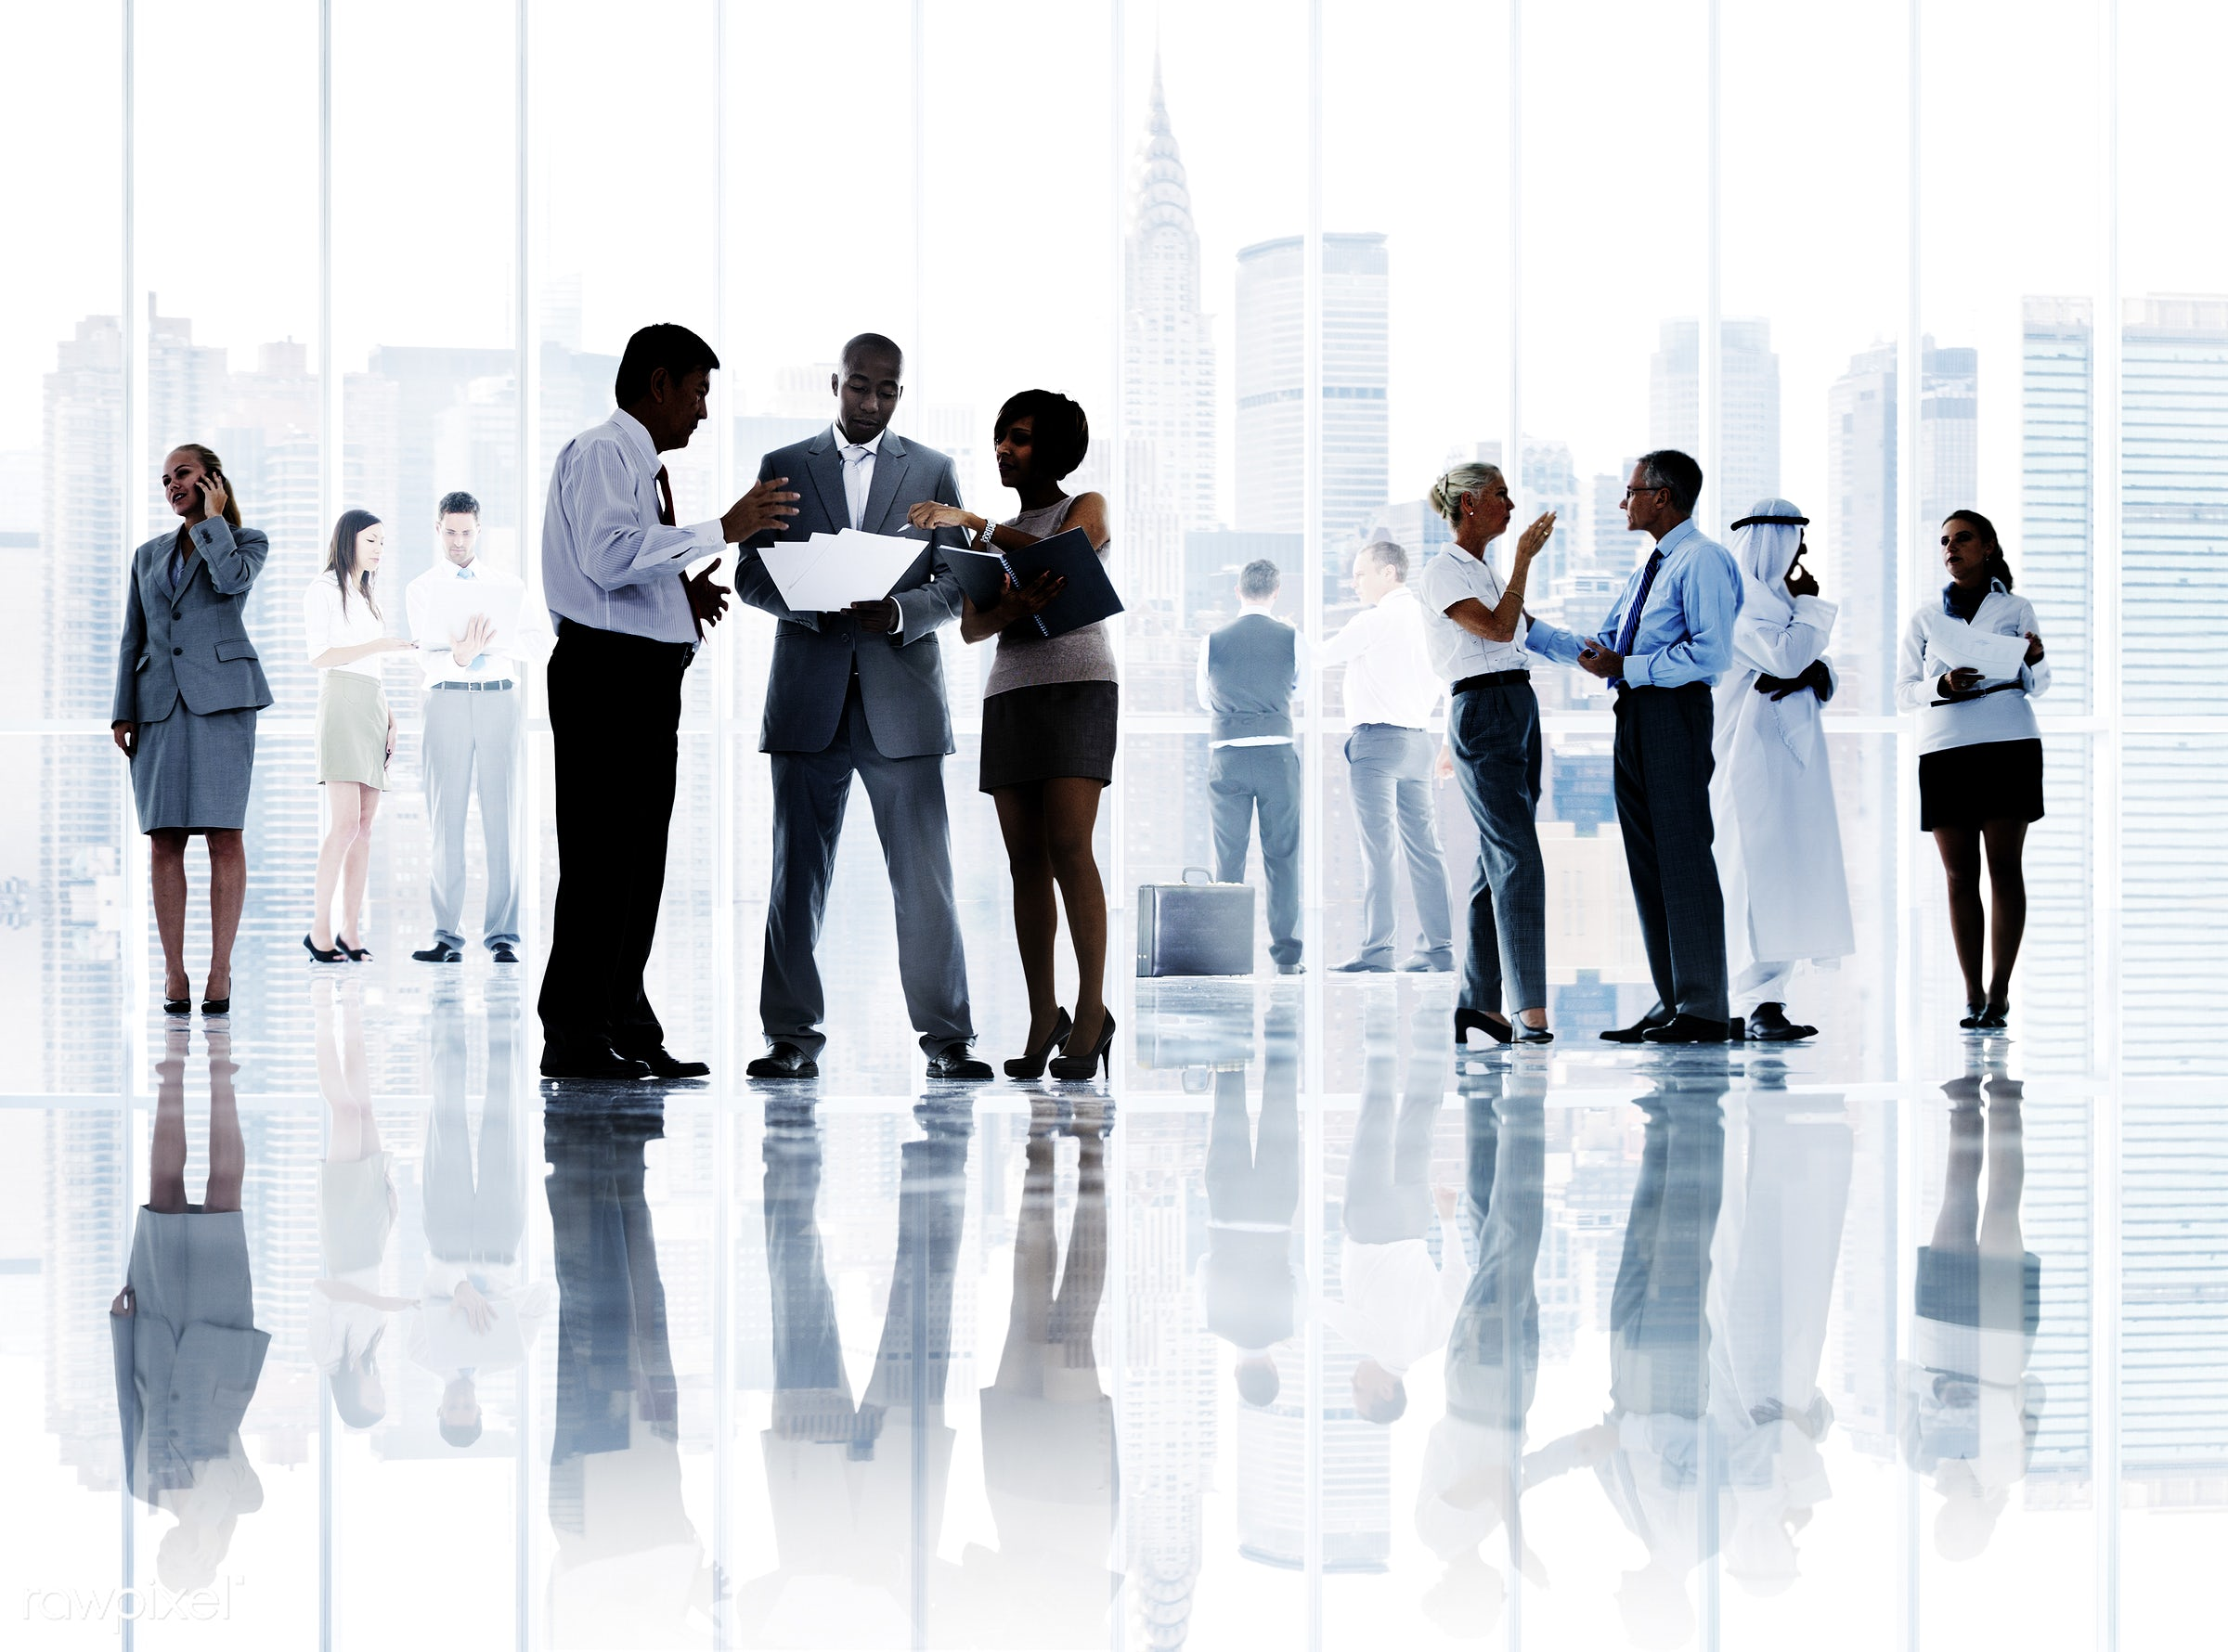 brainstorming, building, business, business people, businessmen, businesswomen, busy, cityscape, colleague, communication,...